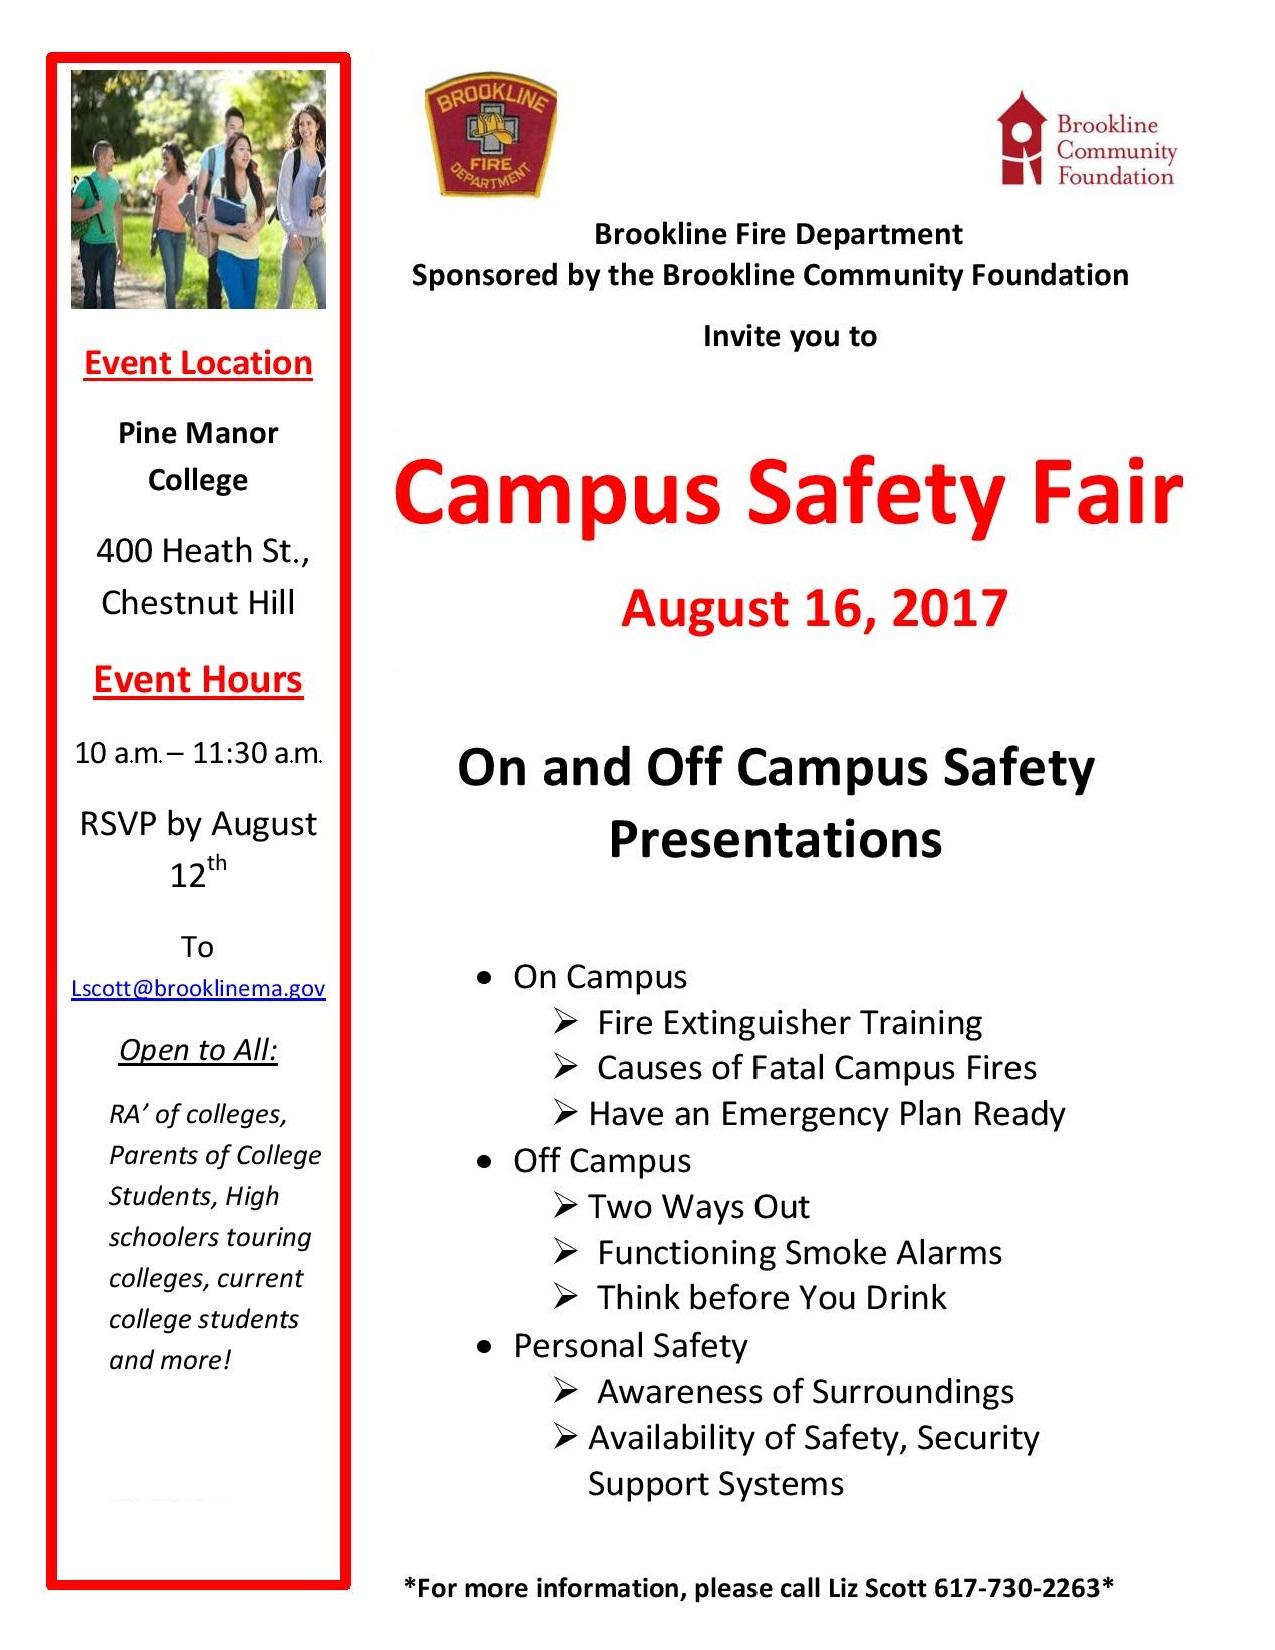 Dainty Print Campus Safety Fair Invitation Ma Chestnut Hill Realty Cleveland Ohio Chestnut Hill Realty Langdon houzz-02 Chestnut Hill Realty